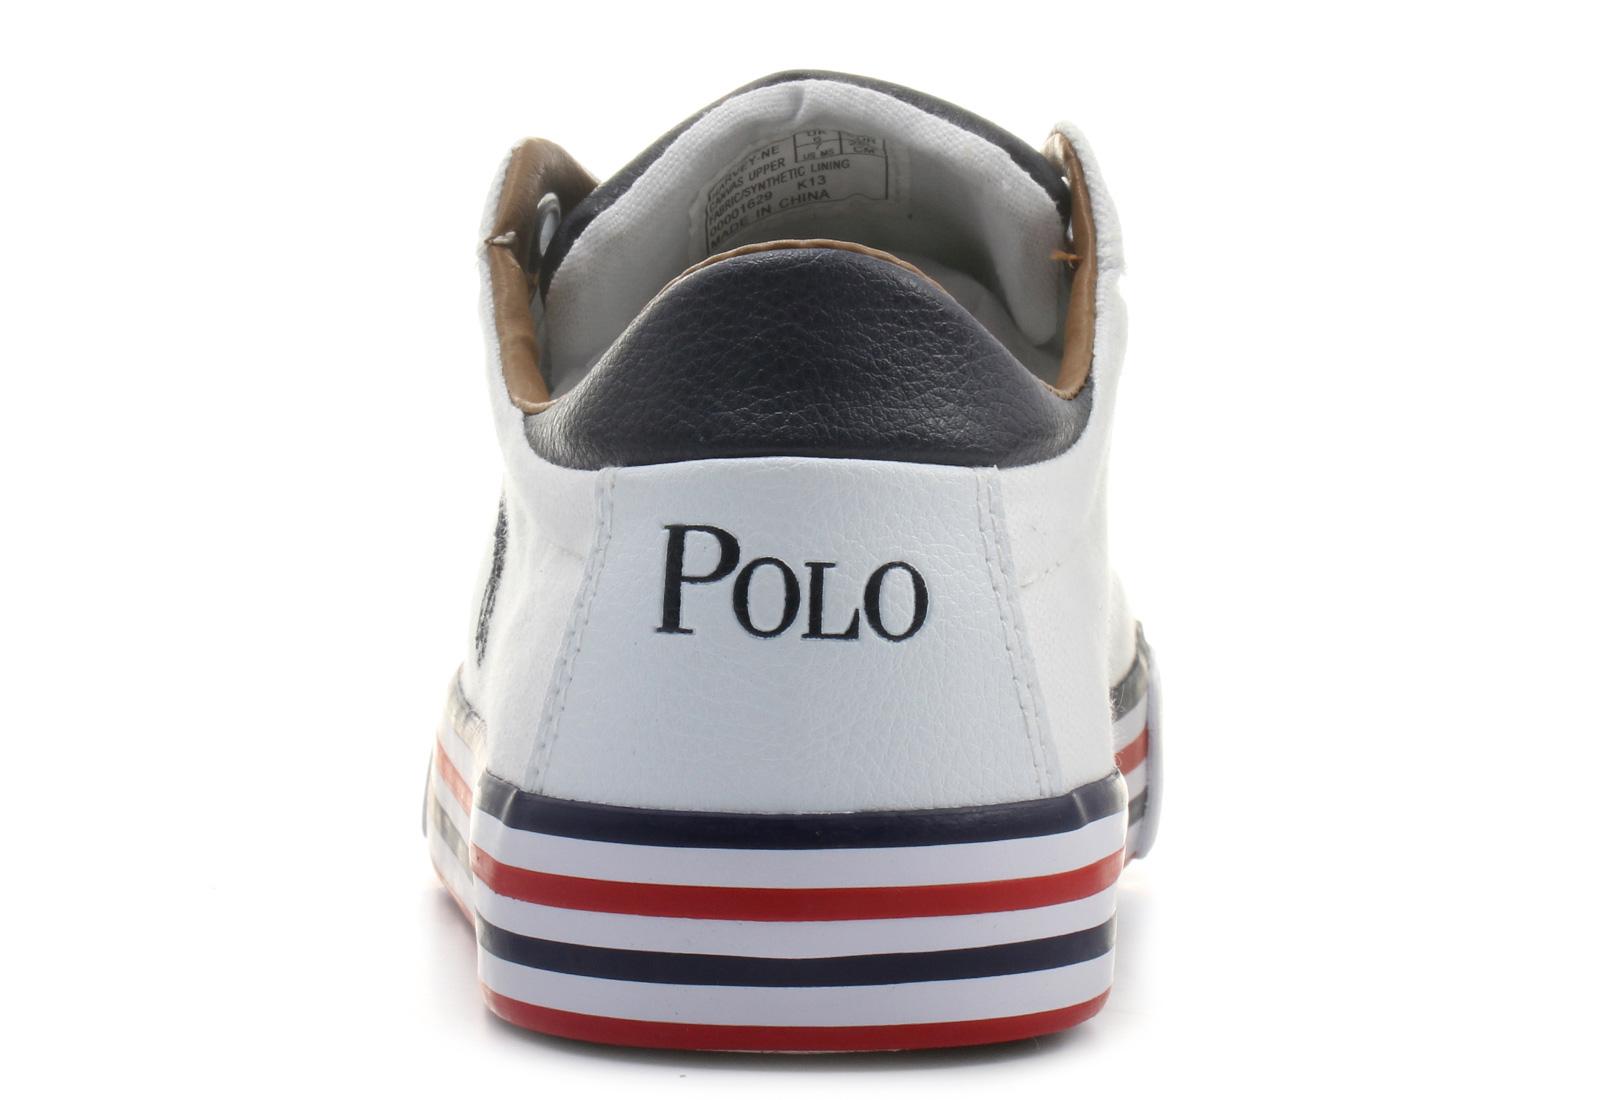 4cfe58eaf4 Polo Ralph Lauren Tenisky - Harvey-ne - 296-c-w1433 - Tenisky ...